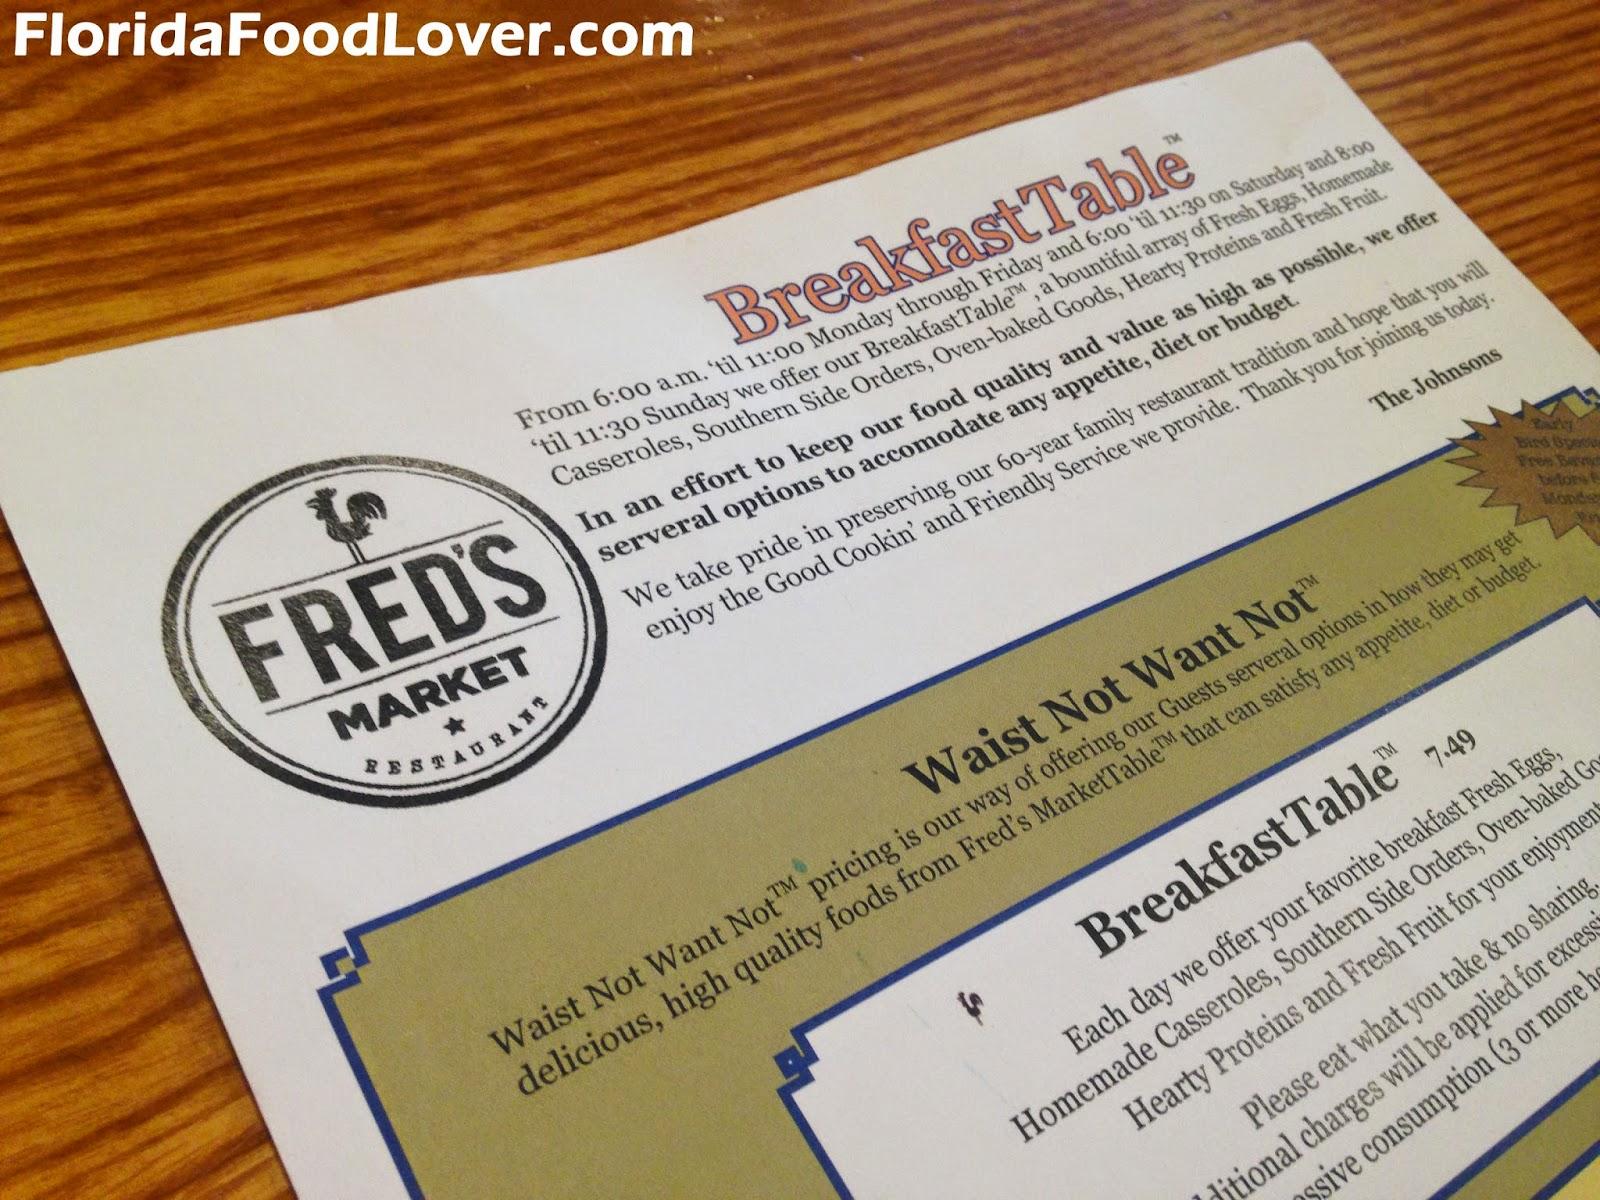 Fred S Market Restaurant Plant City Florida